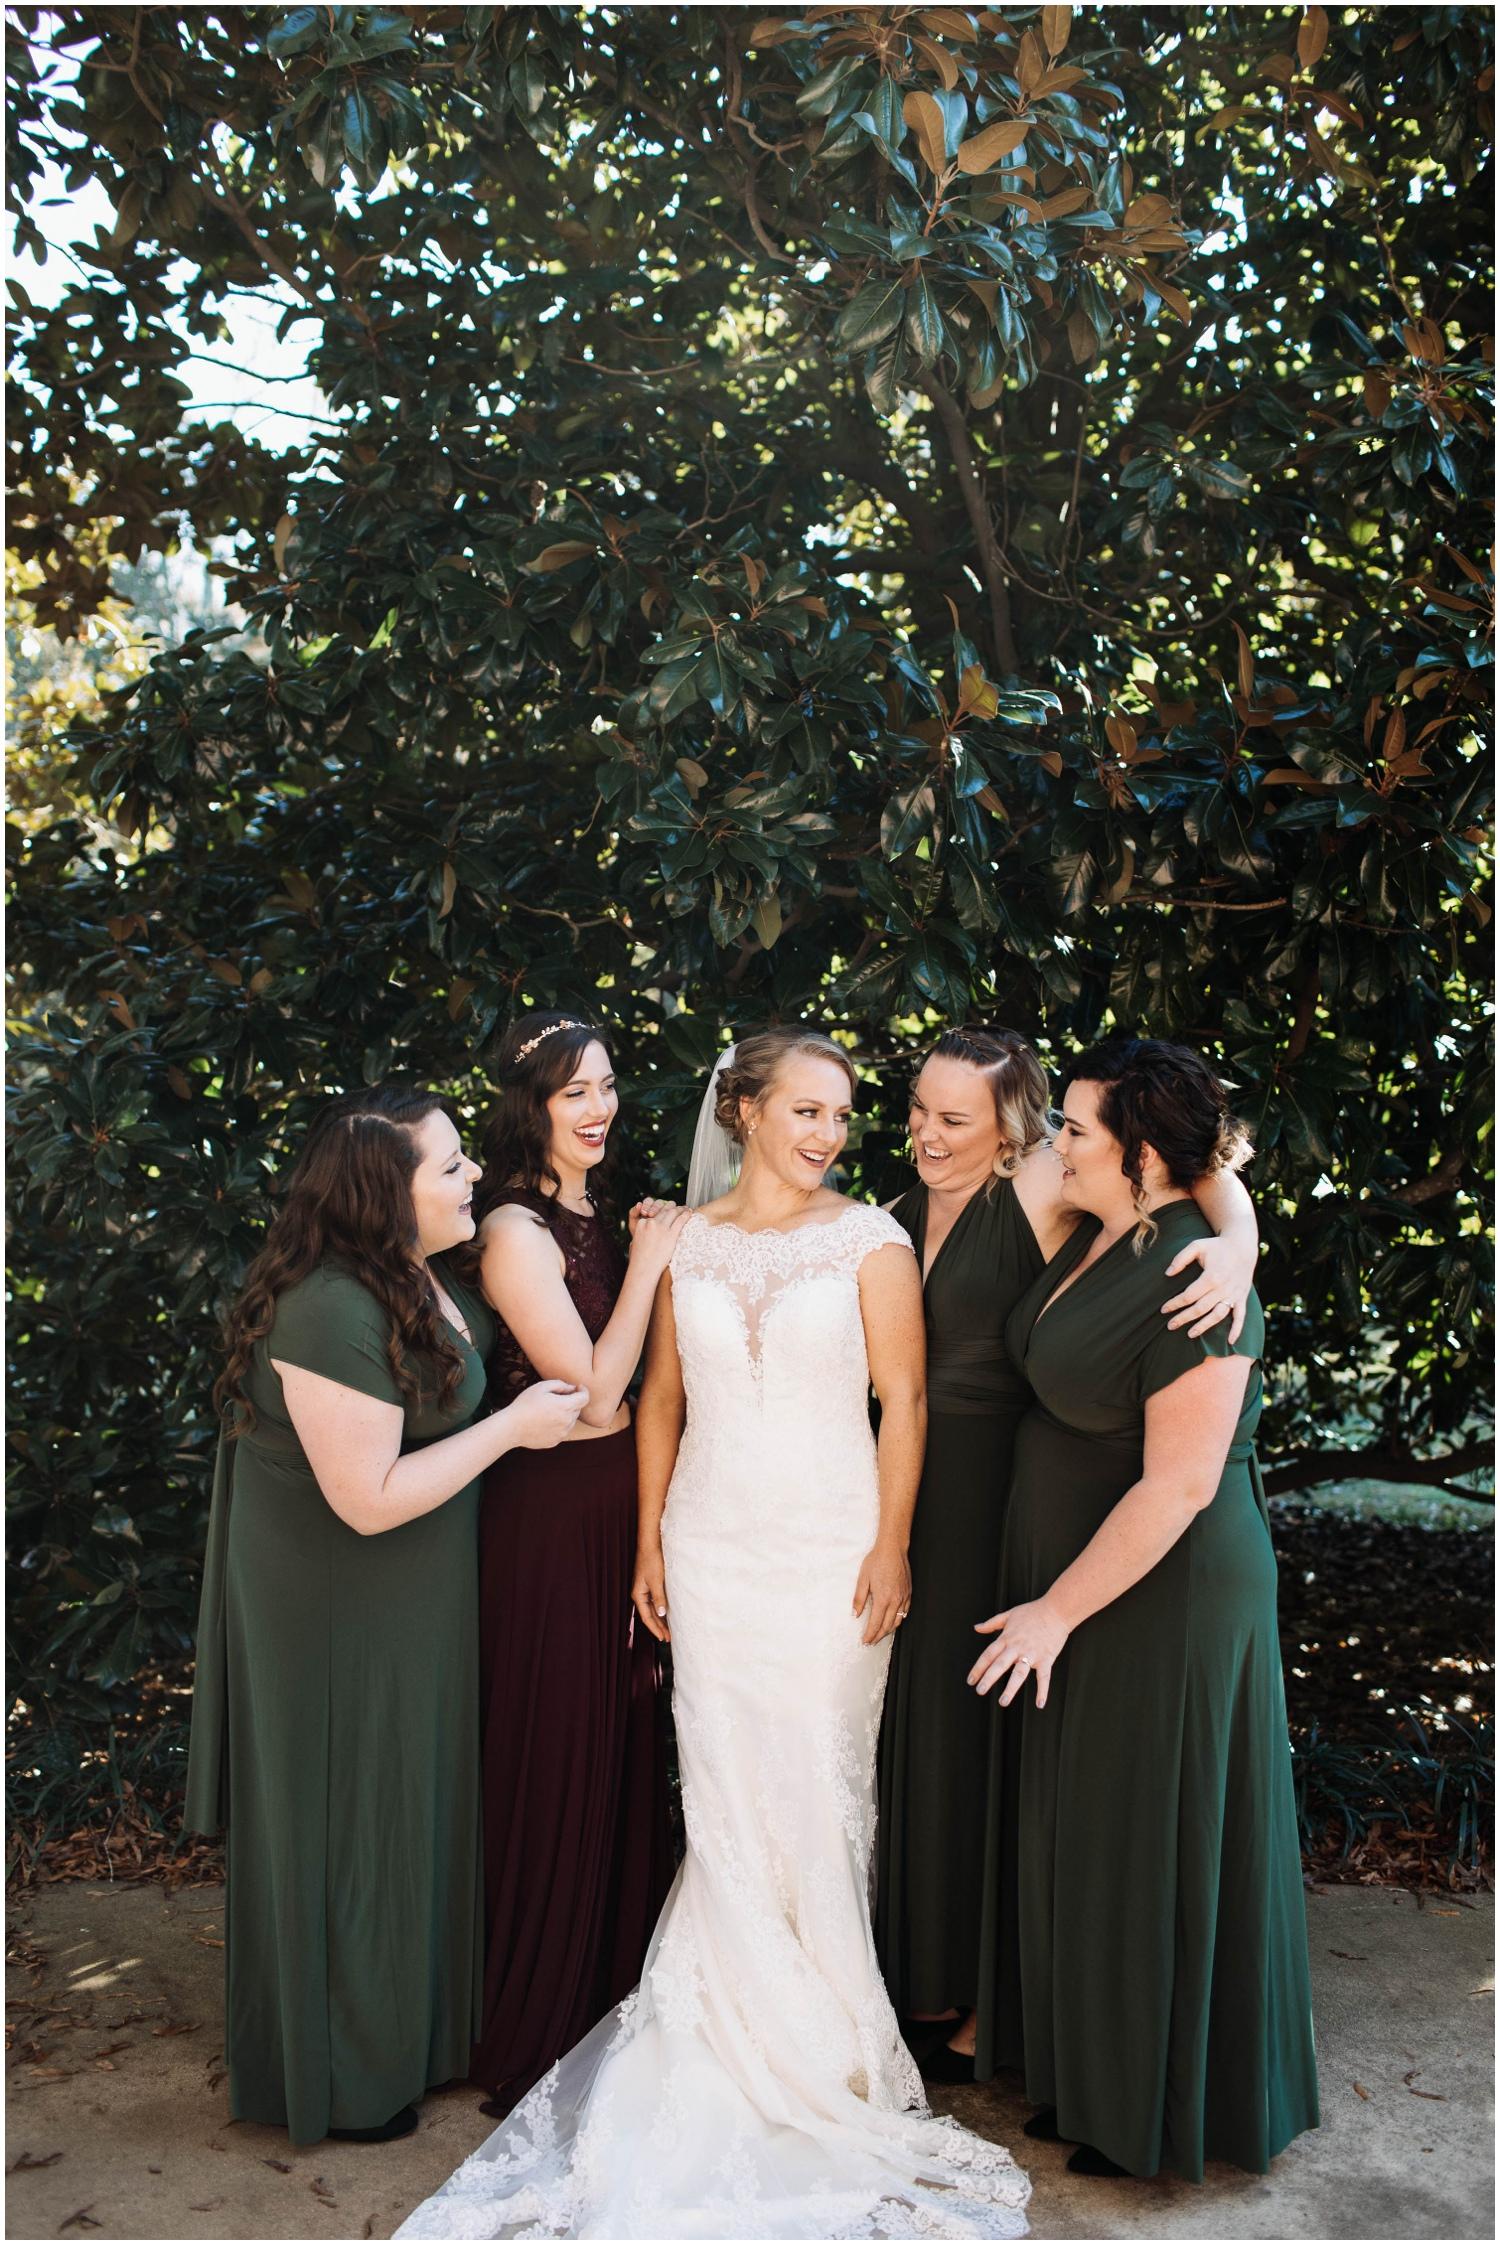 Jess+Dan_rustic_southern_farm_fall_wedding_charlotte_north carolina_taylor powers_0342.jpg